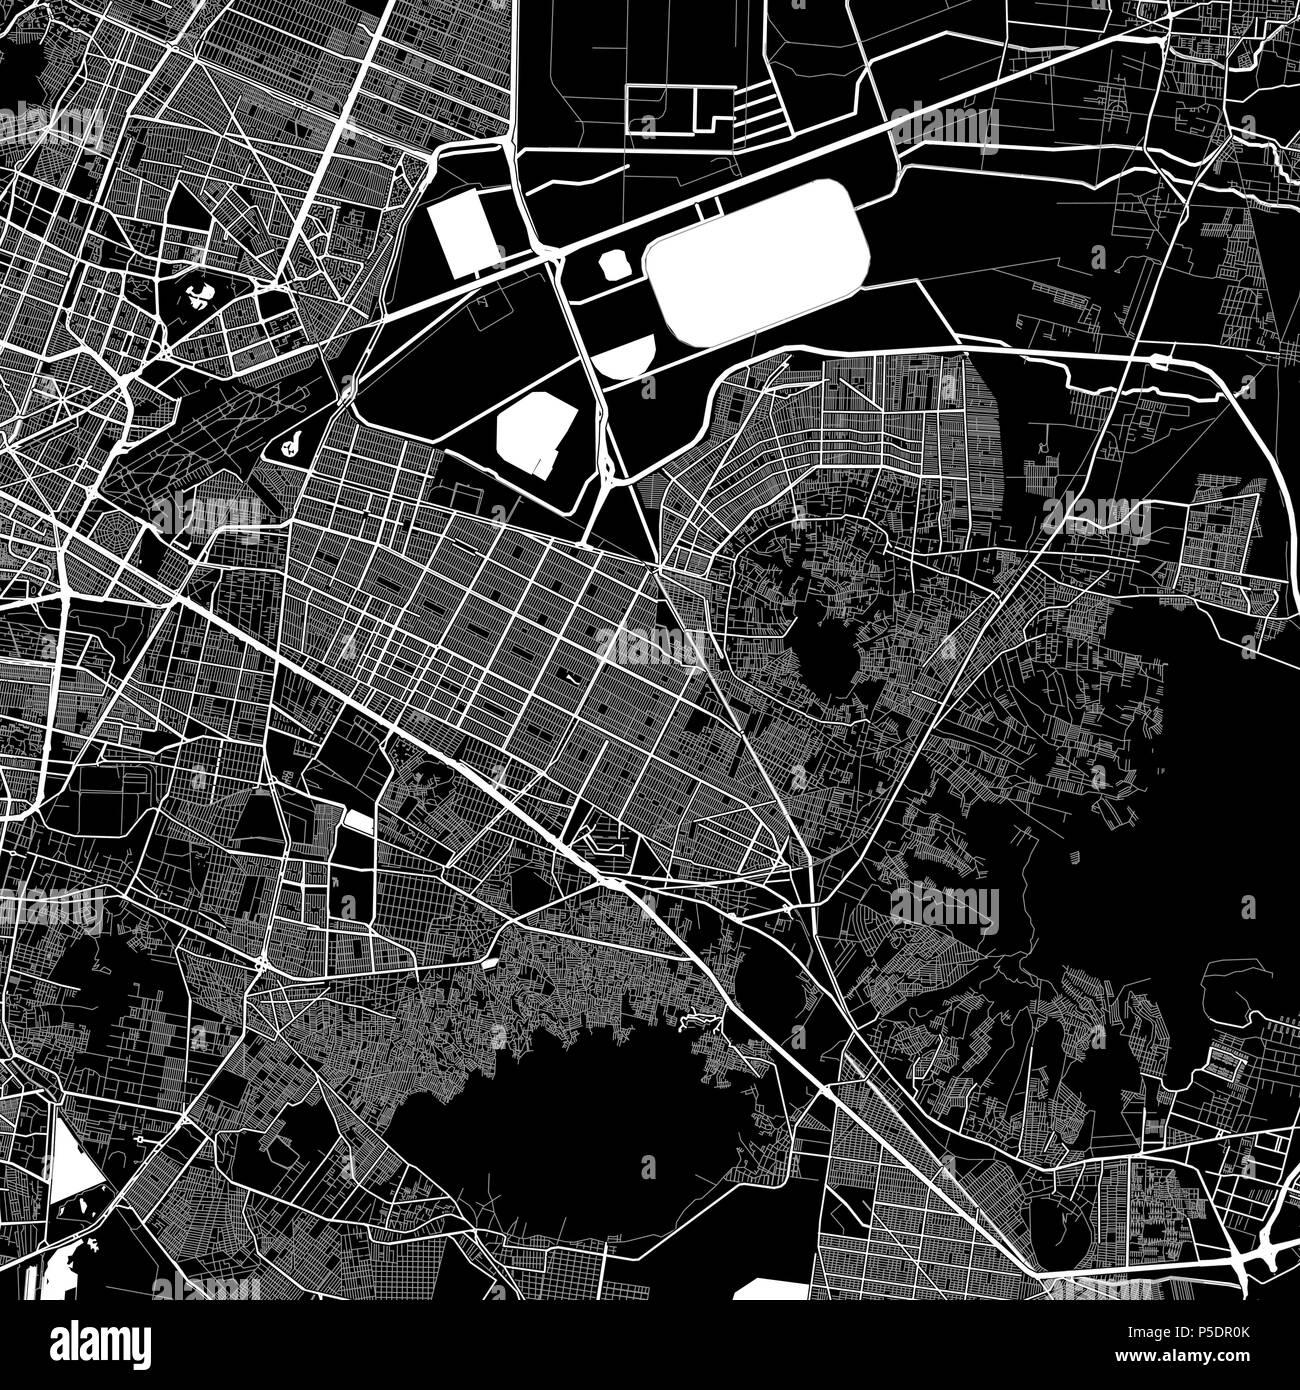 Nezahualcoyotl Mexico Map.Area Map Of Nezahualcoyotl Mexico Dark Background Version For